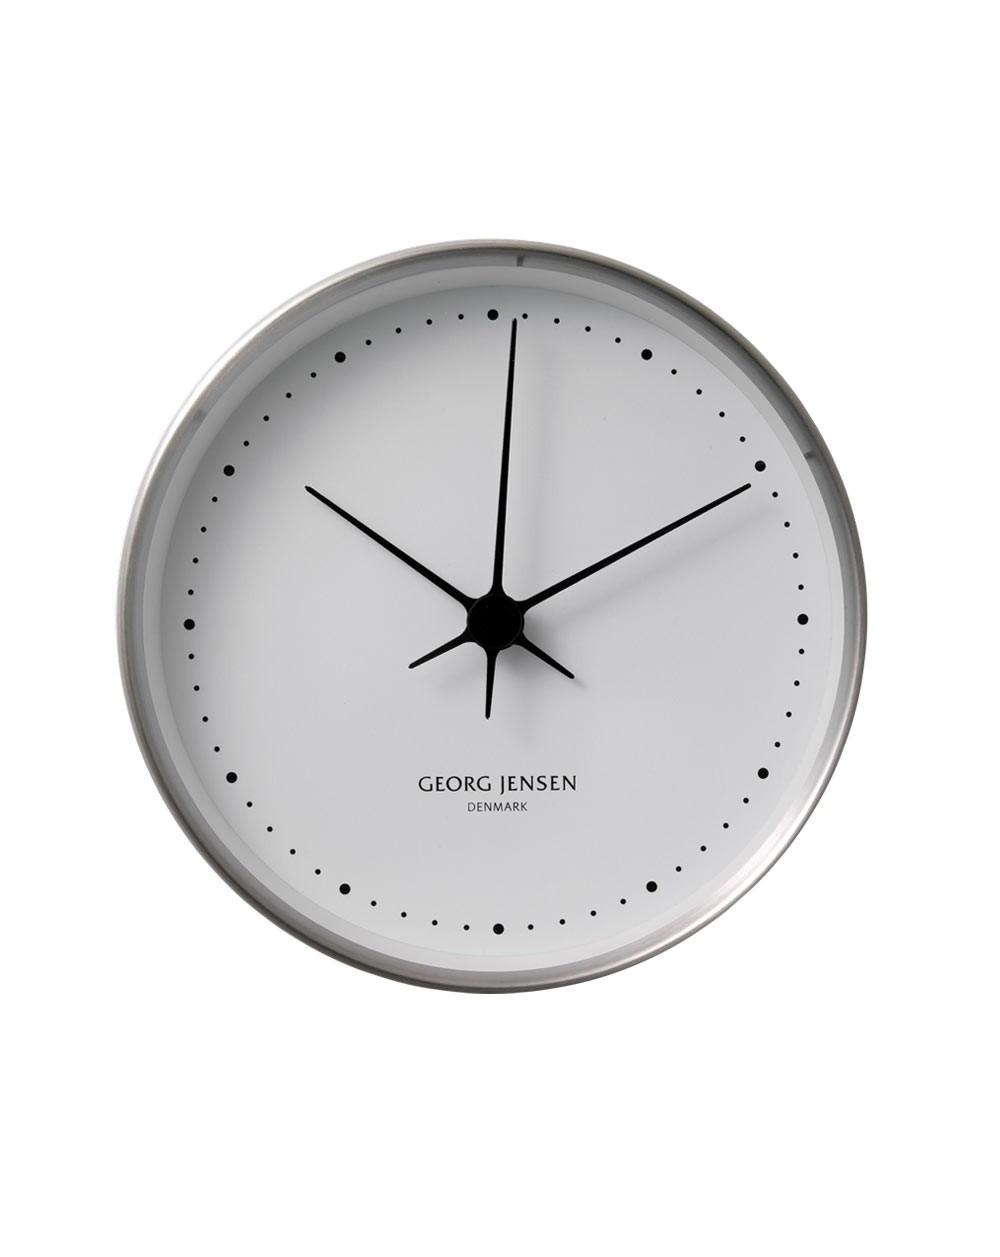 Cadrans Koppel (horloge, thermomètre, hydromètre, baromètre)